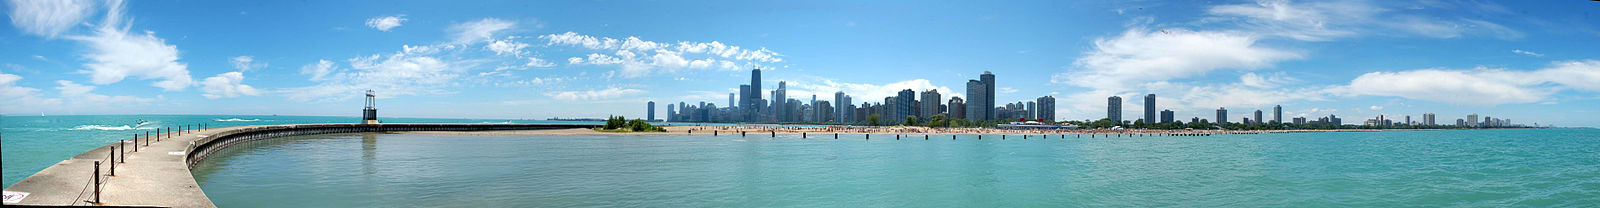 il gancio in Chicago Heights